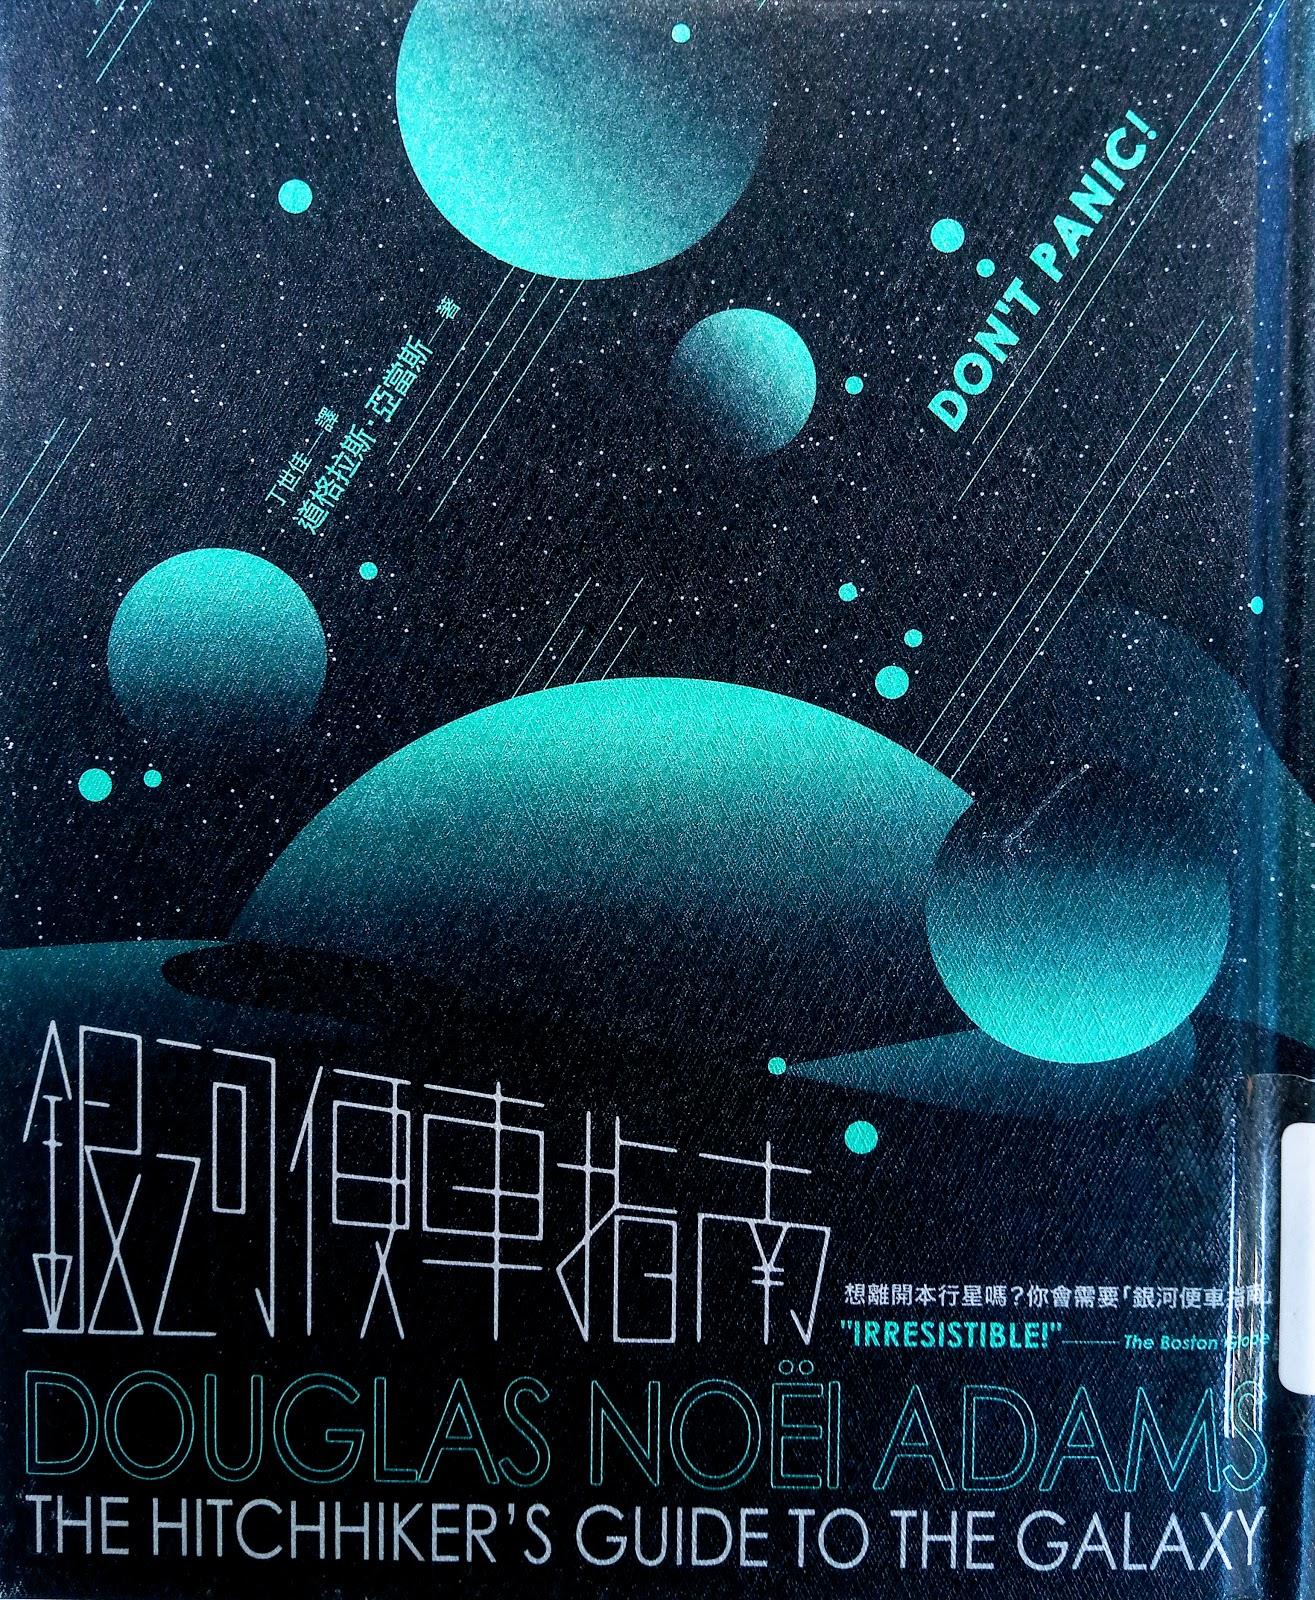 [心得] 《銀河便車指南》(The Hitchhiker's Guide to the Galaxy)